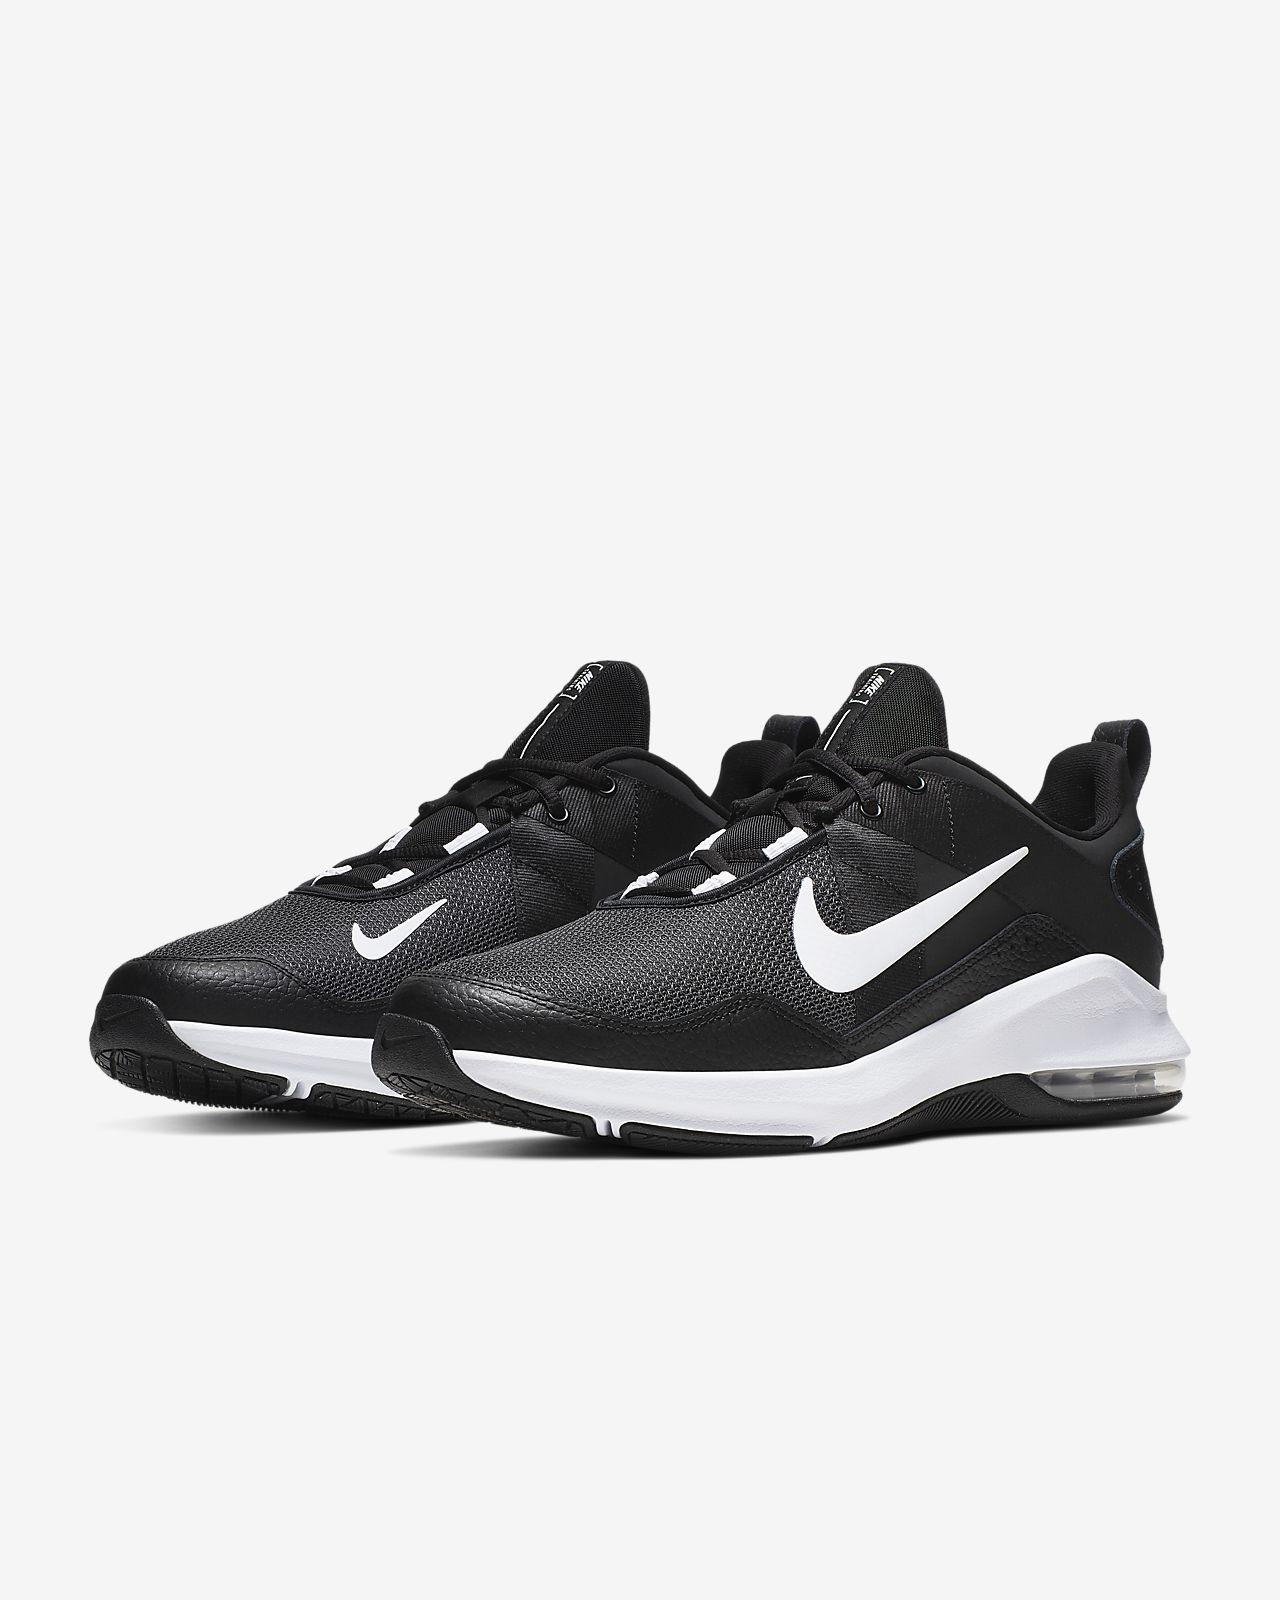 Nike »Air Max Alpha Trainer 2« Sneaker kaufen   OTTO